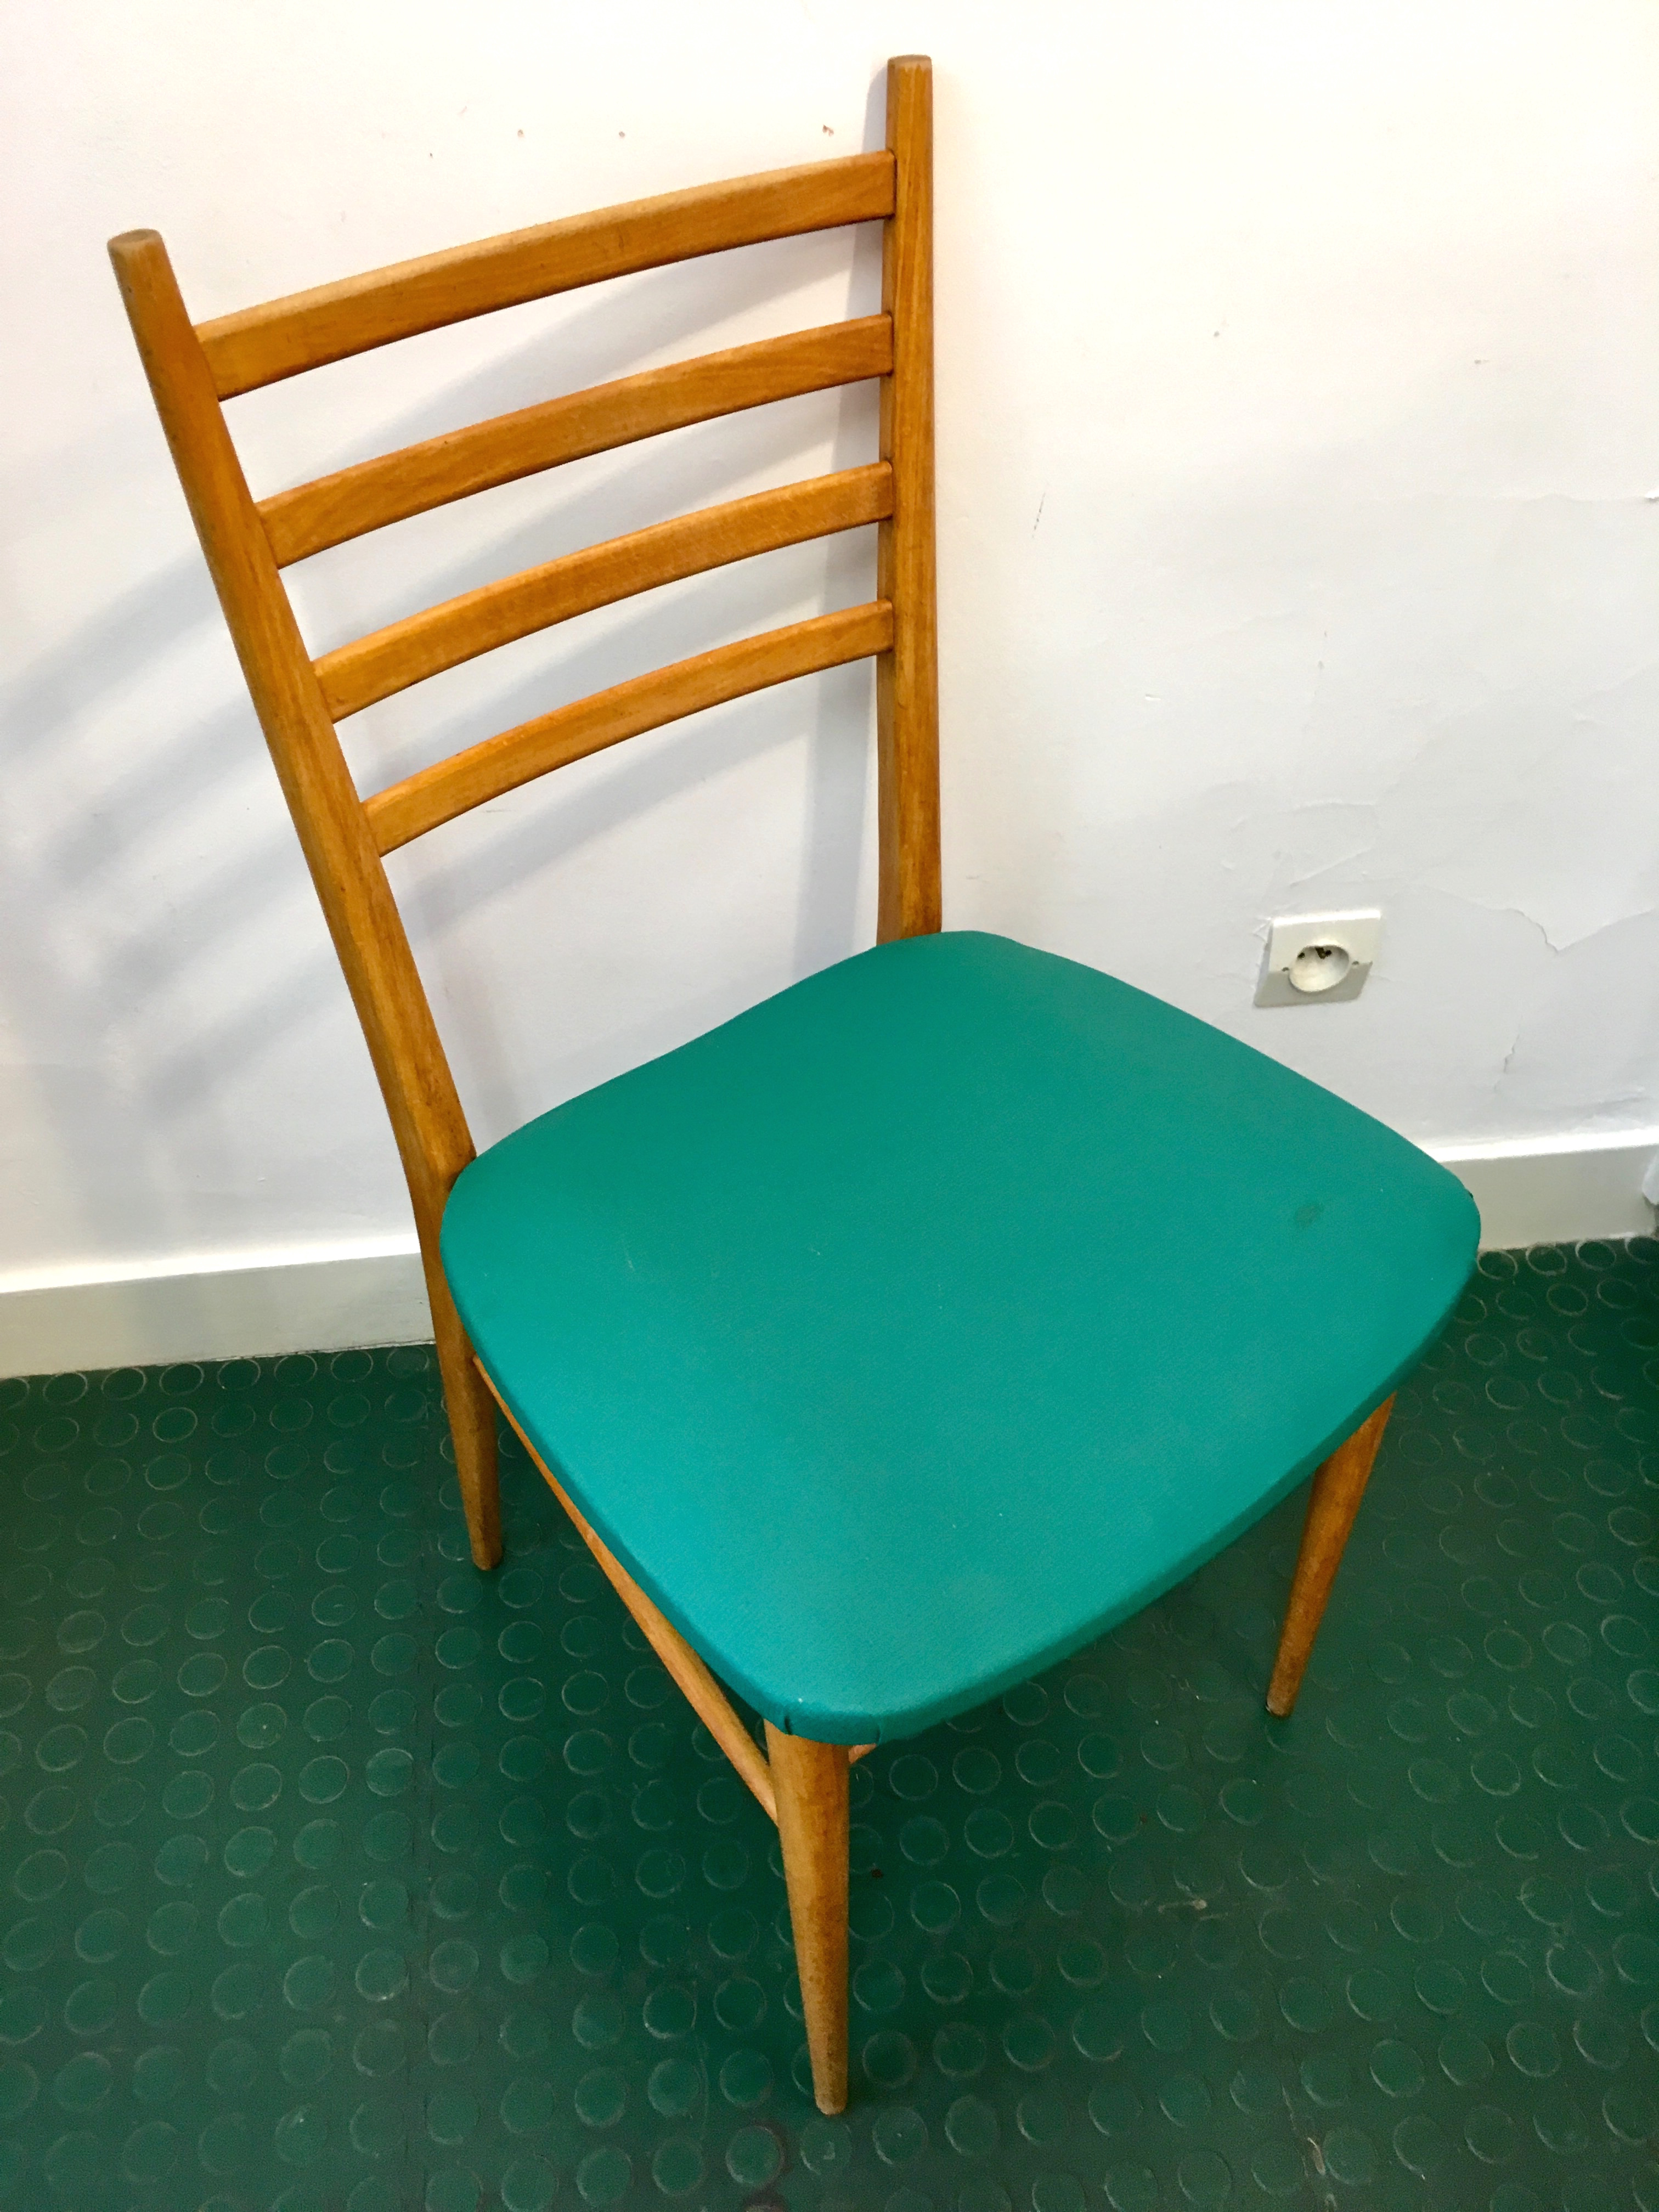 chaise r tro bois et ska vert annees 50 brocnshop. Black Bedroom Furniture Sets. Home Design Ideas